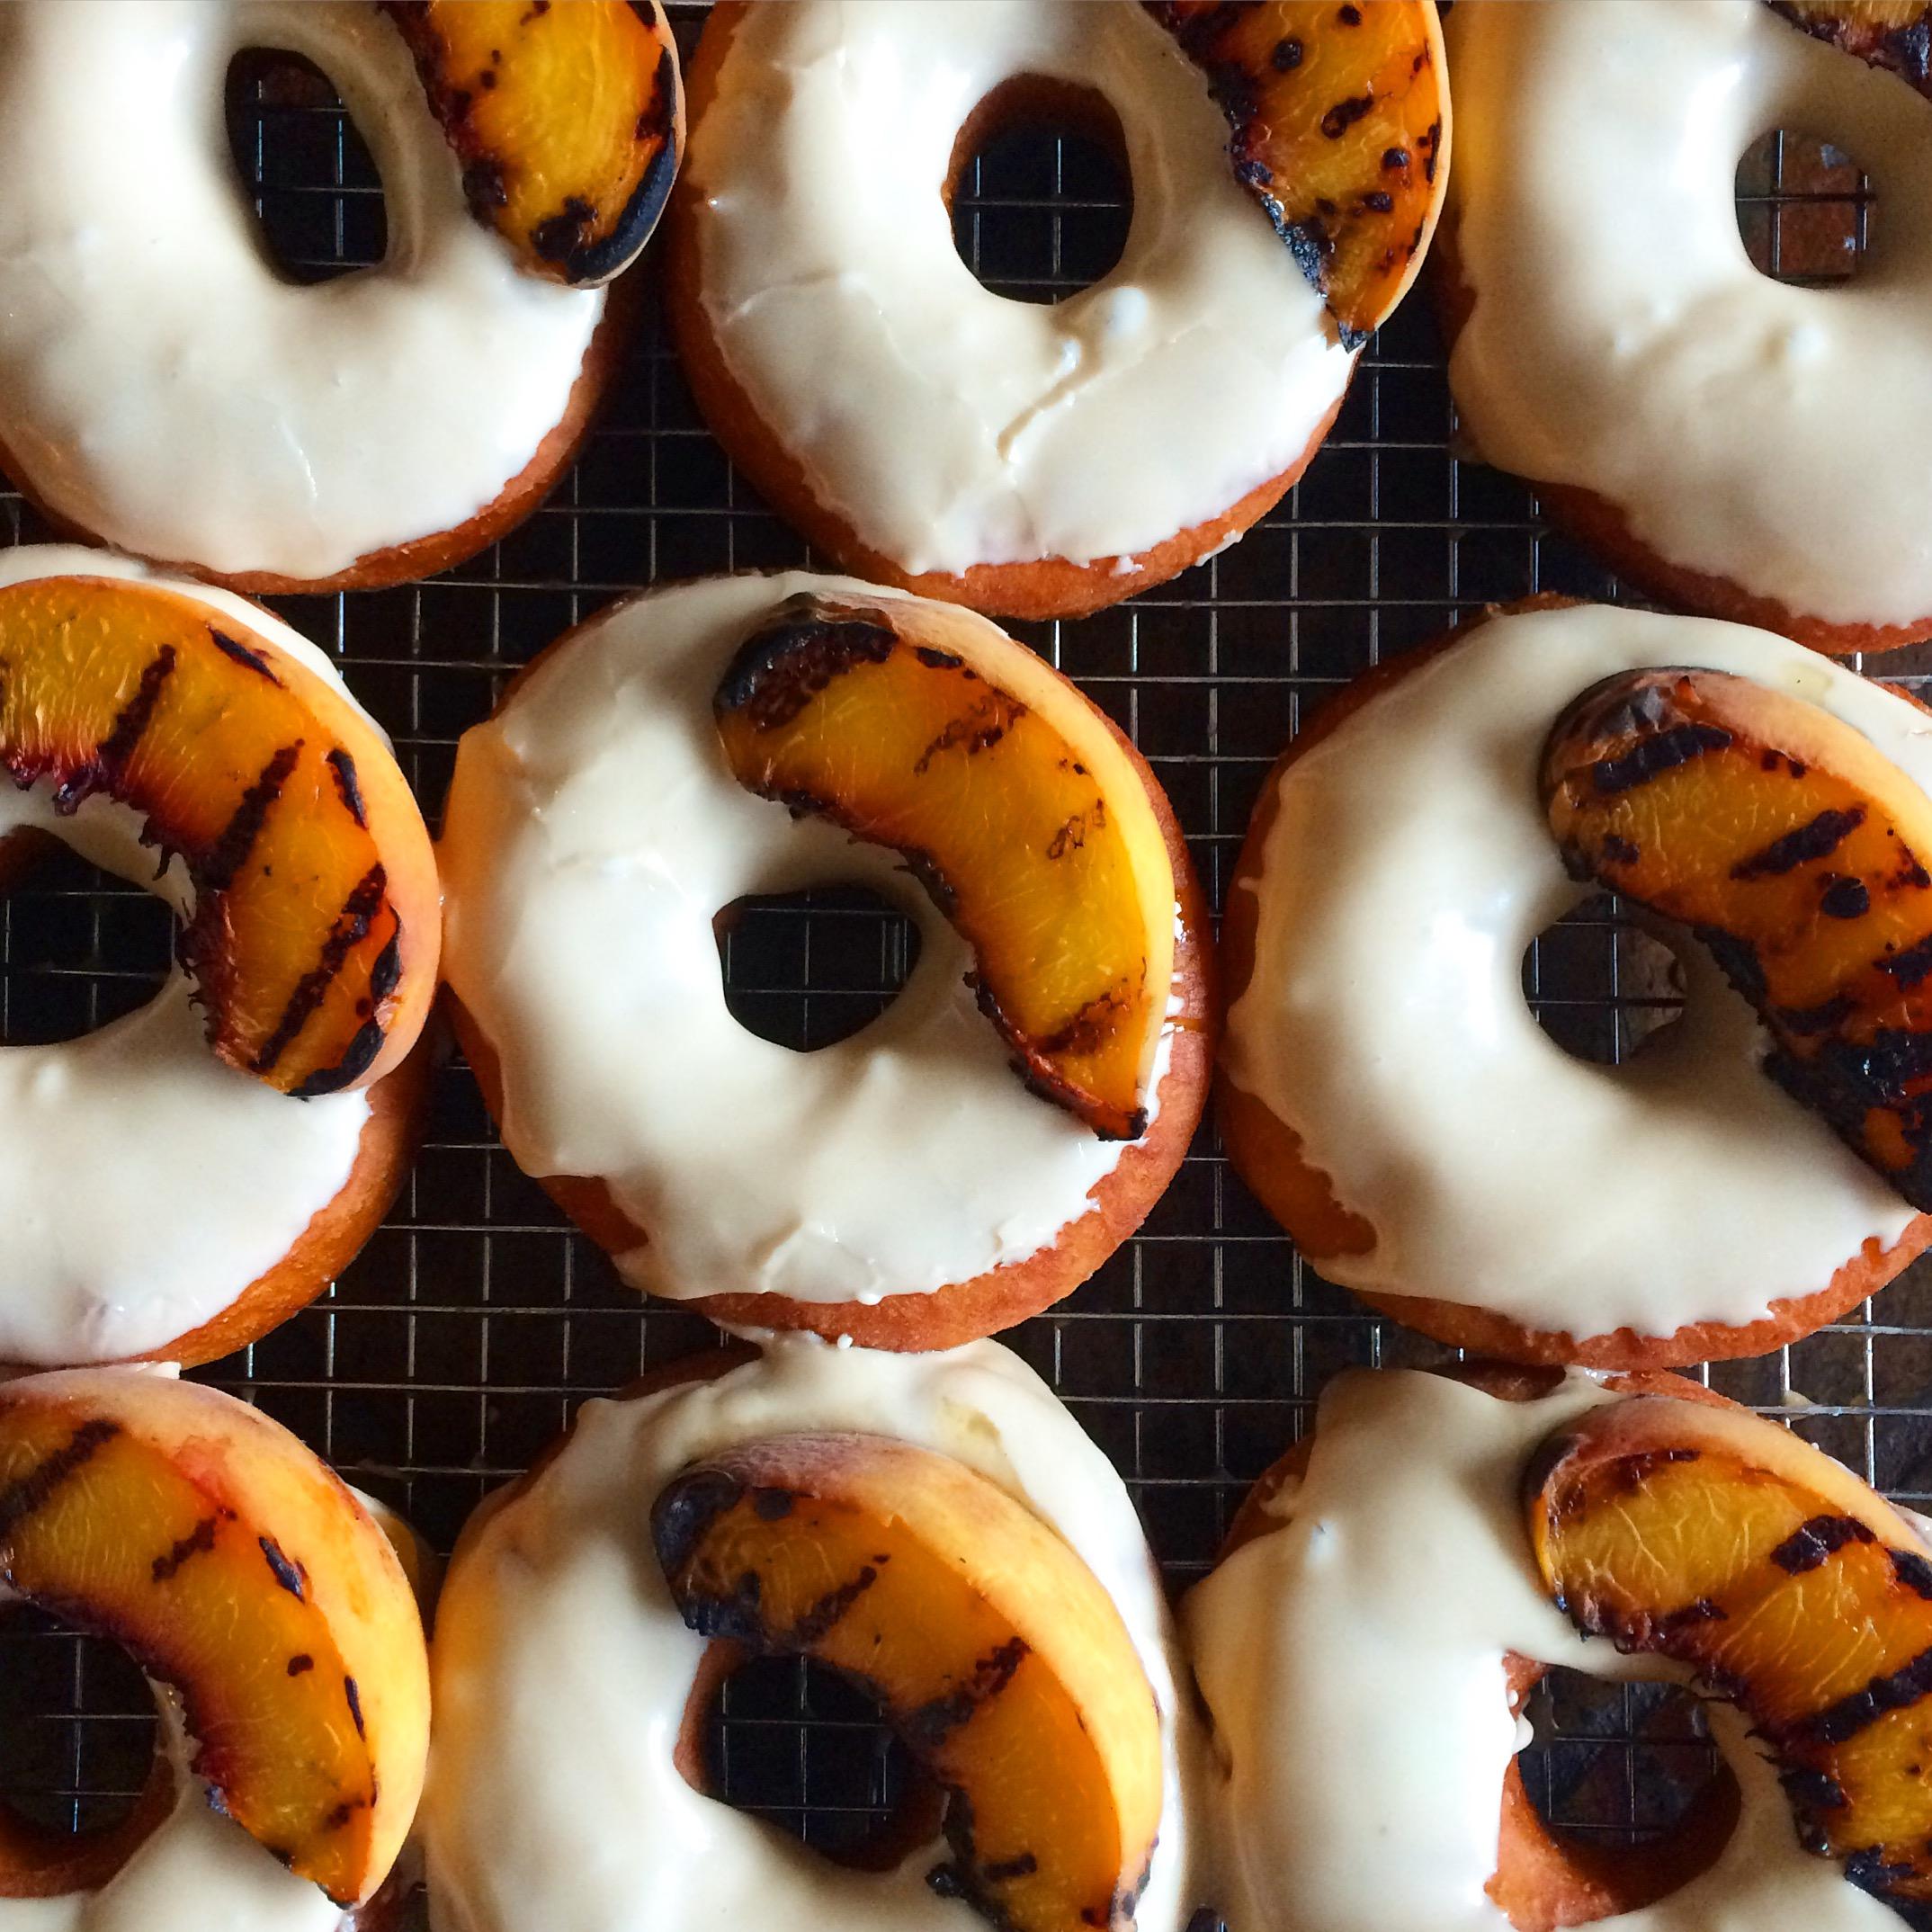 Vanilla Bourbon Glazed with Grilled Peach